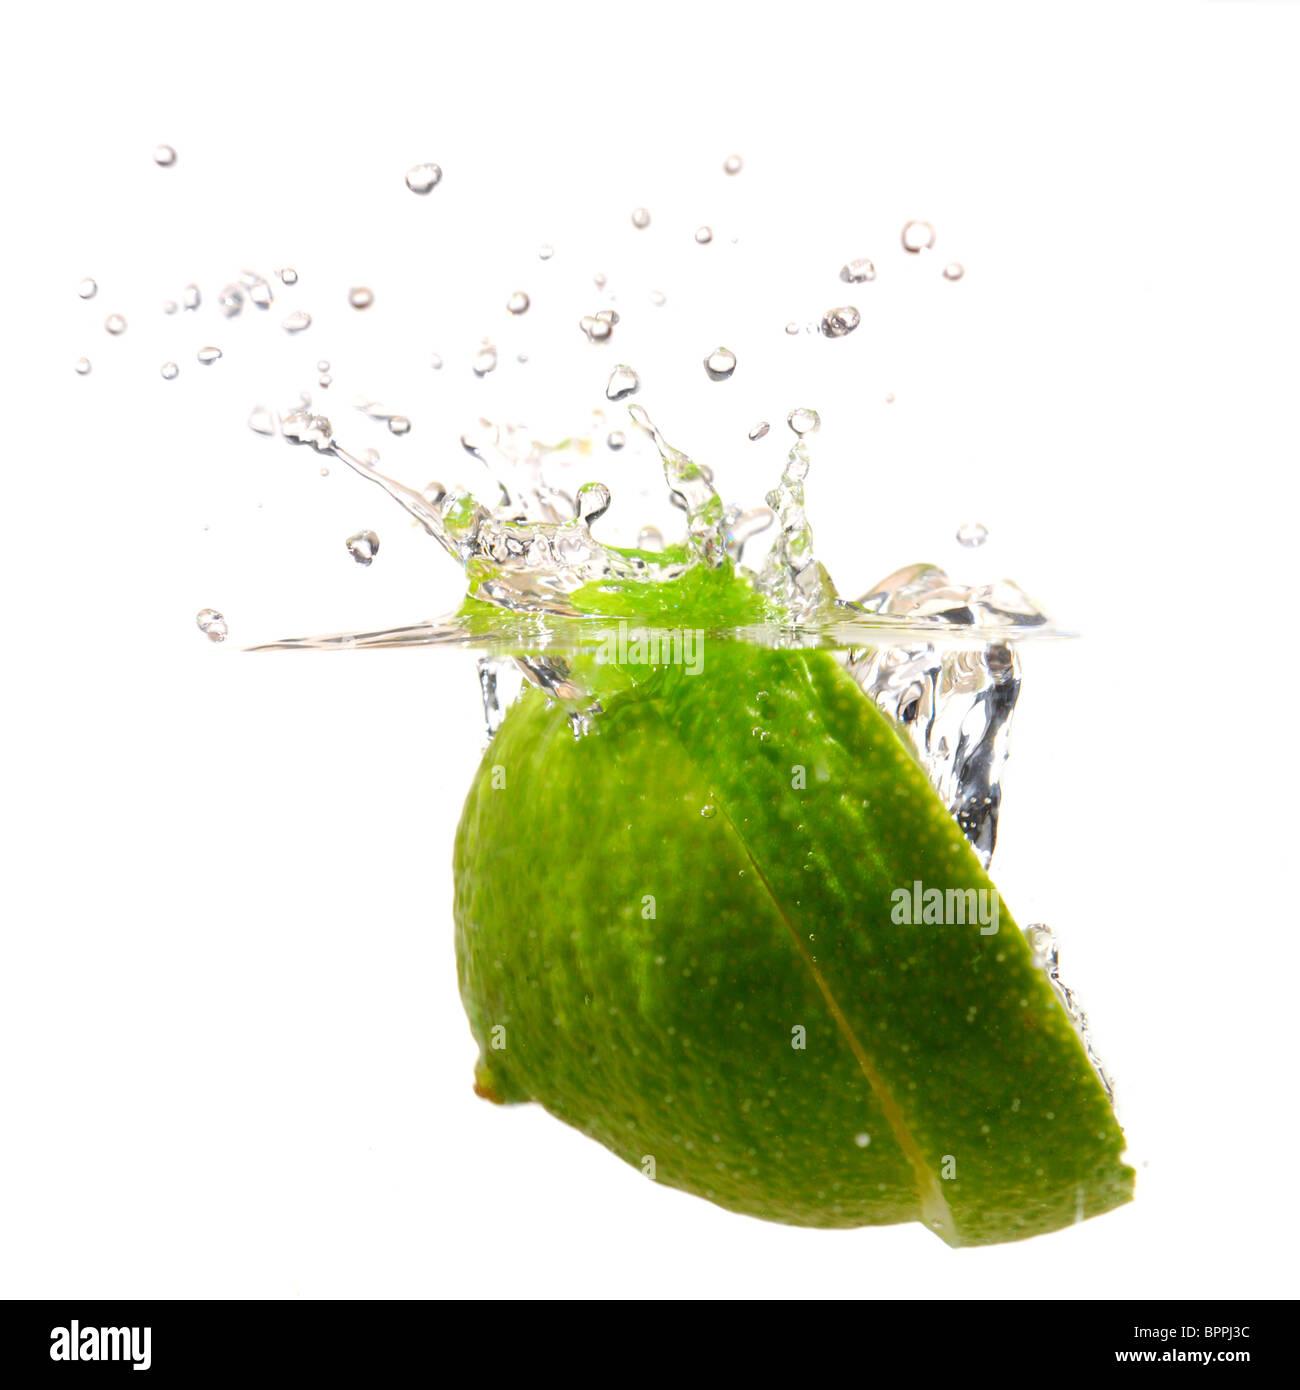 Lime splashing into water studio isolated on white background - Stock Image